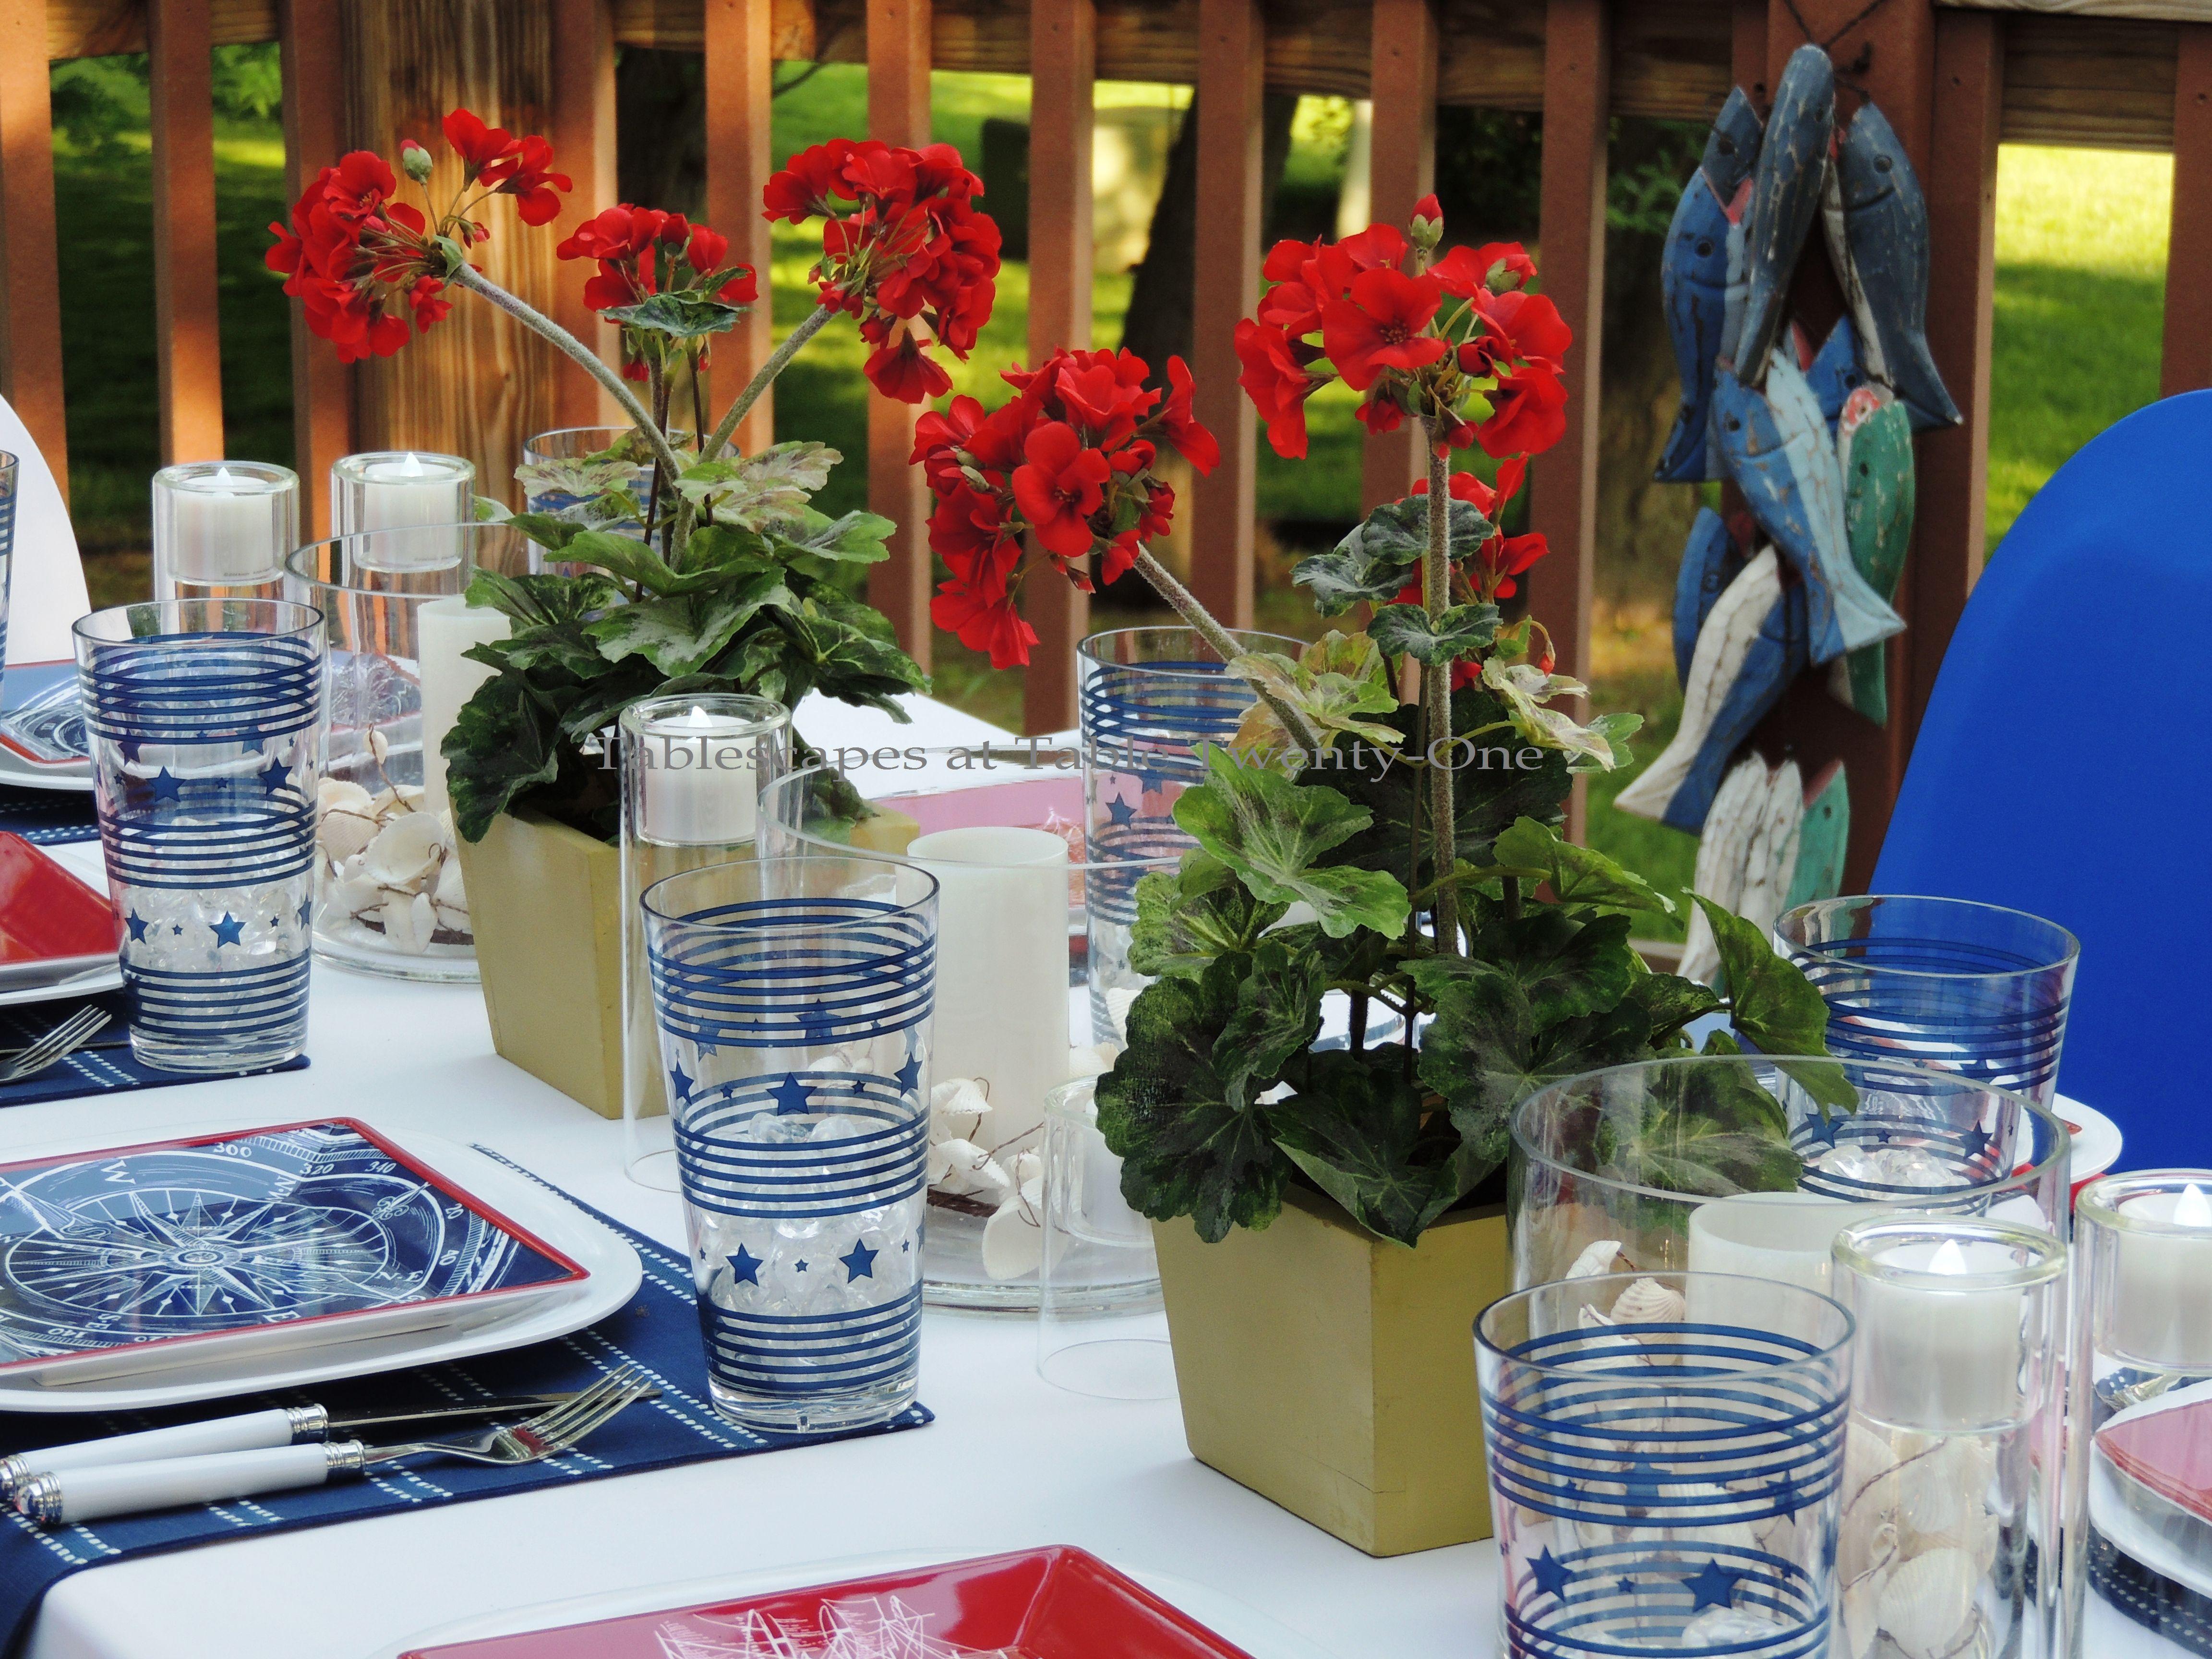 Tablescapes at Table Twenty-One, www.tabletwentyone.wordpress.com, 4th of July Coastal Style: red geranium centerpiece